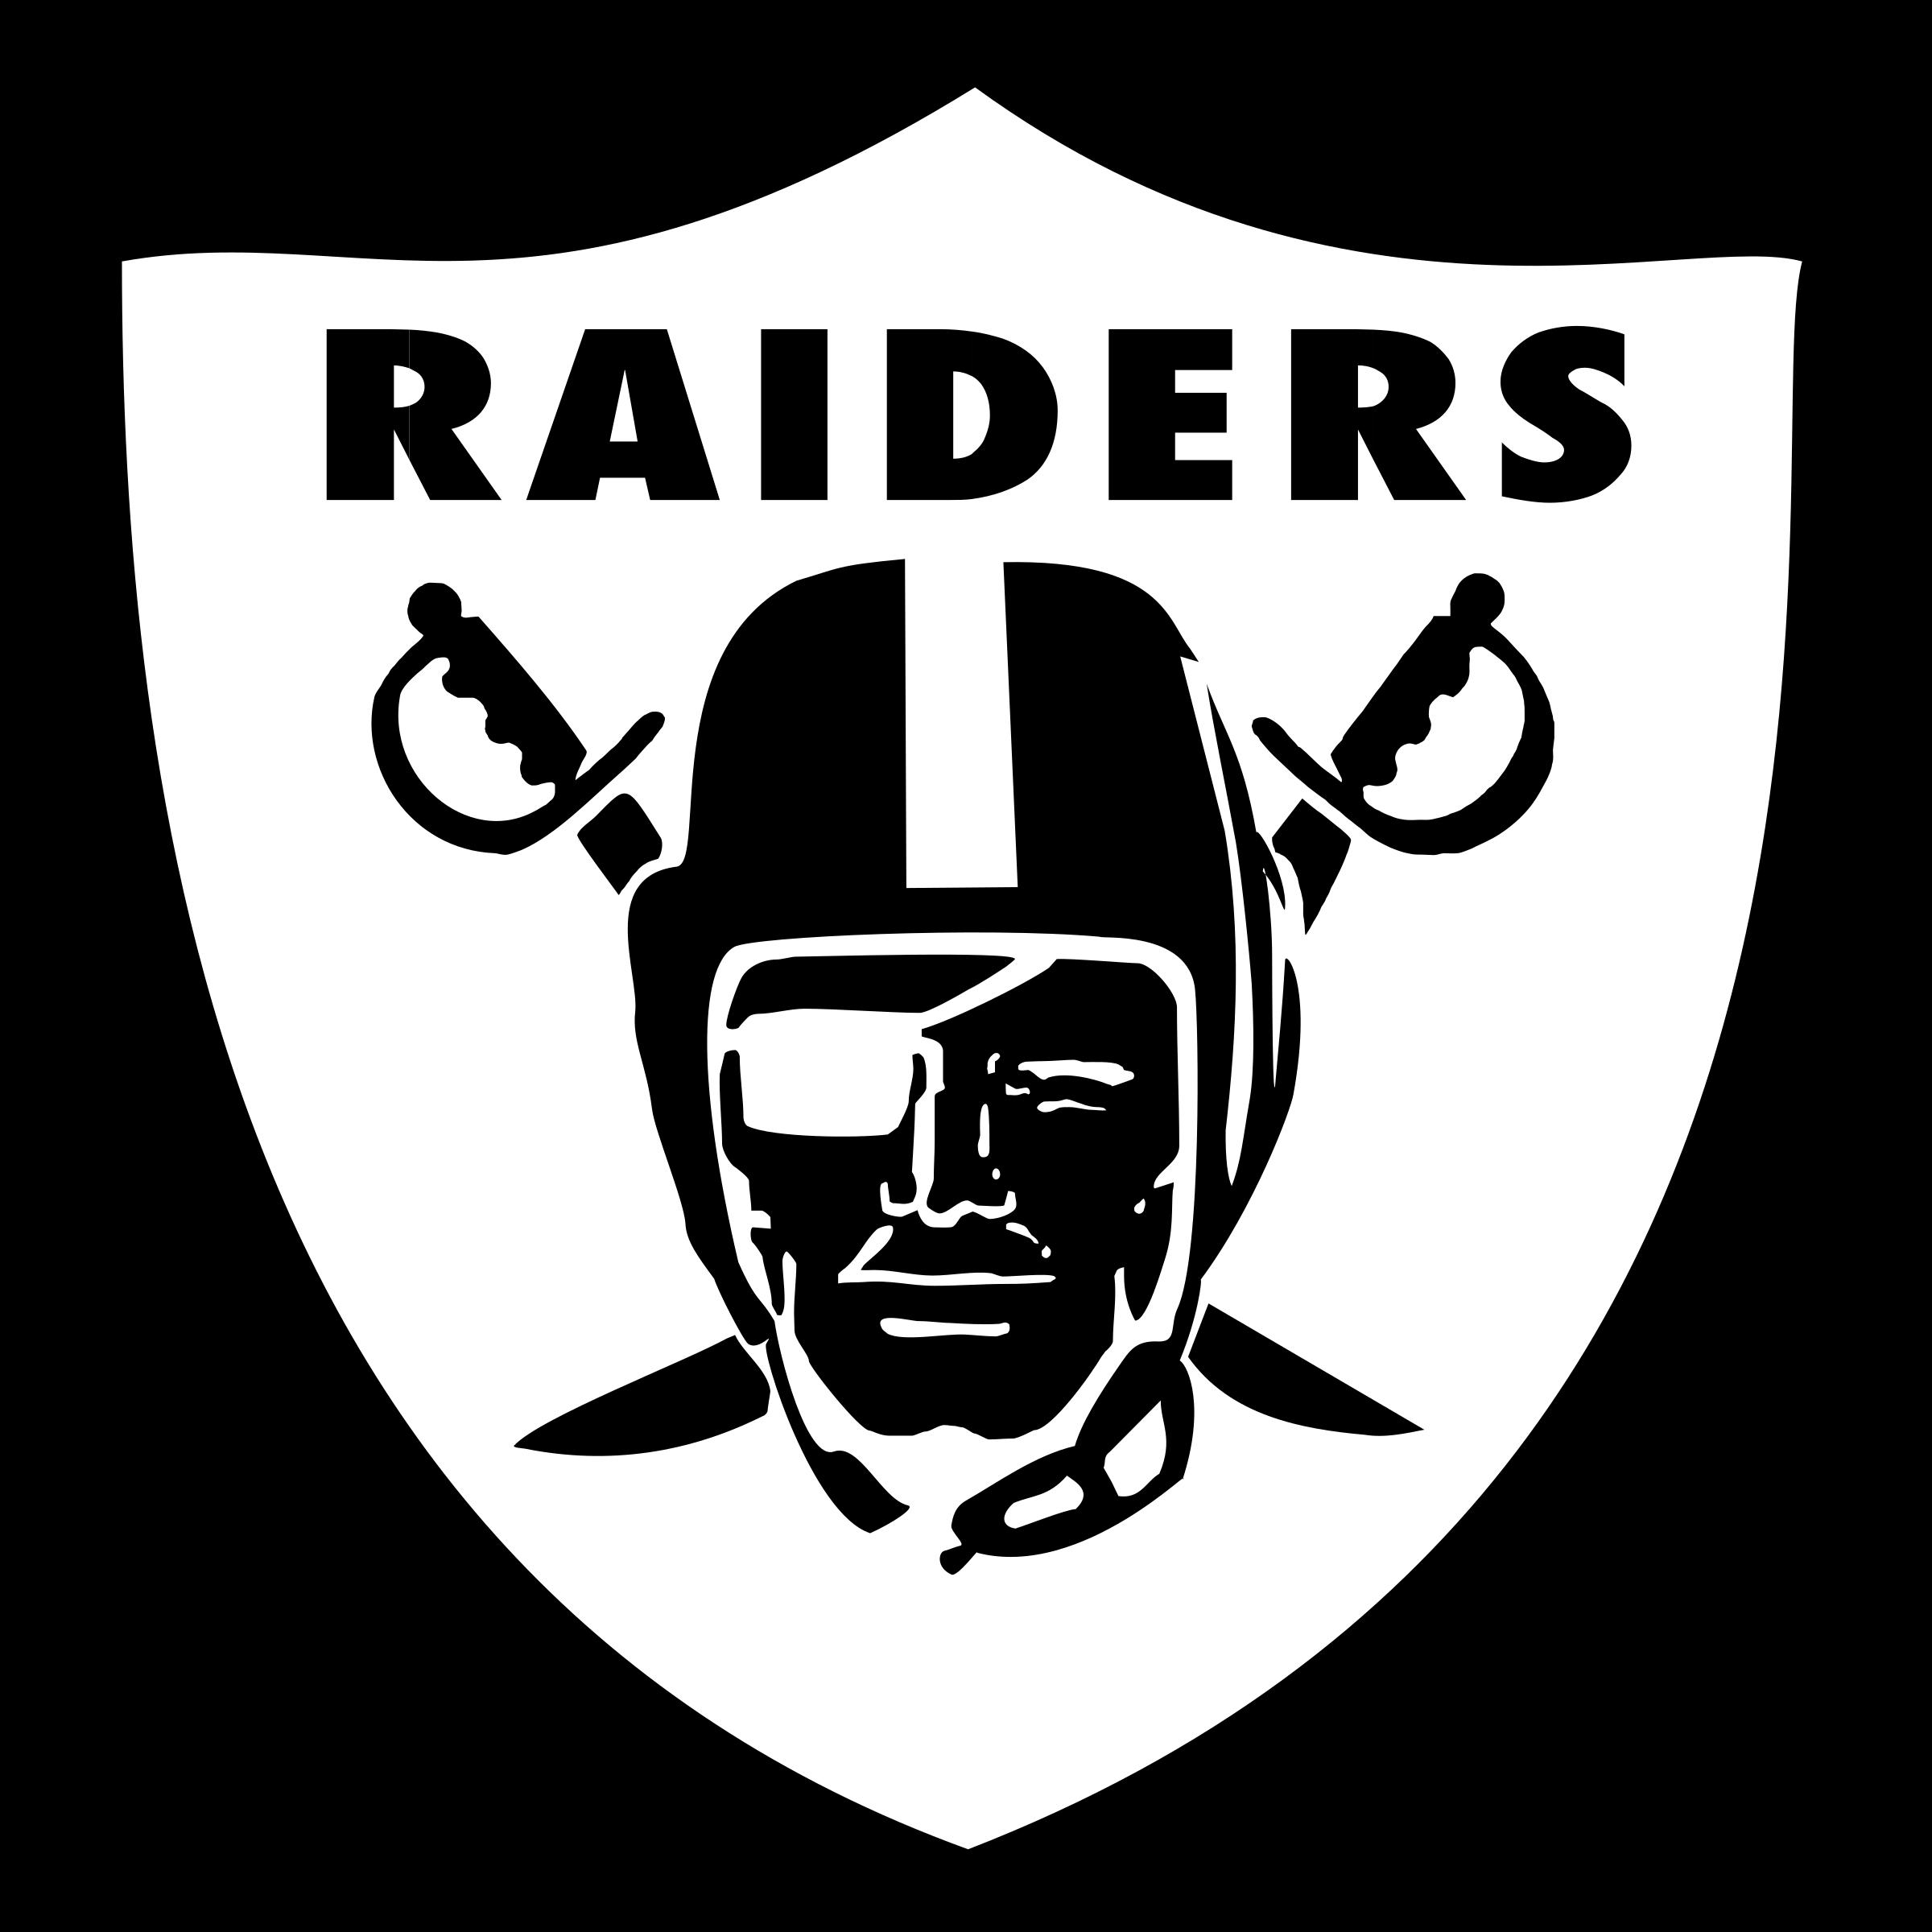 raiders logo svg #968, Download drawings